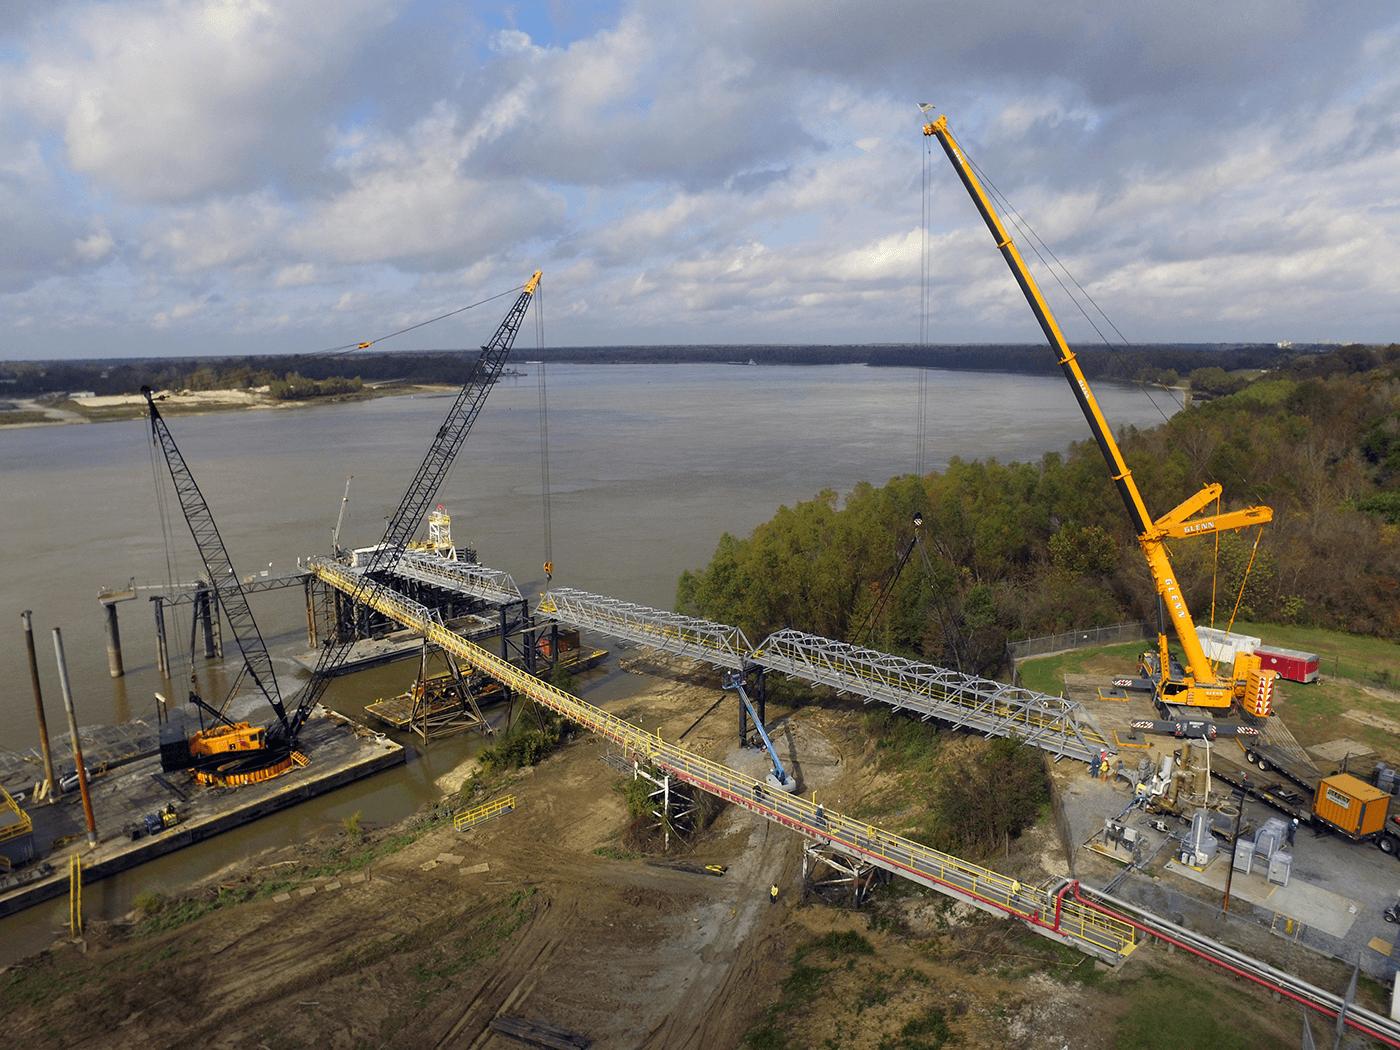 Kostmayer_dock_access_bridge_01_DJI_0306